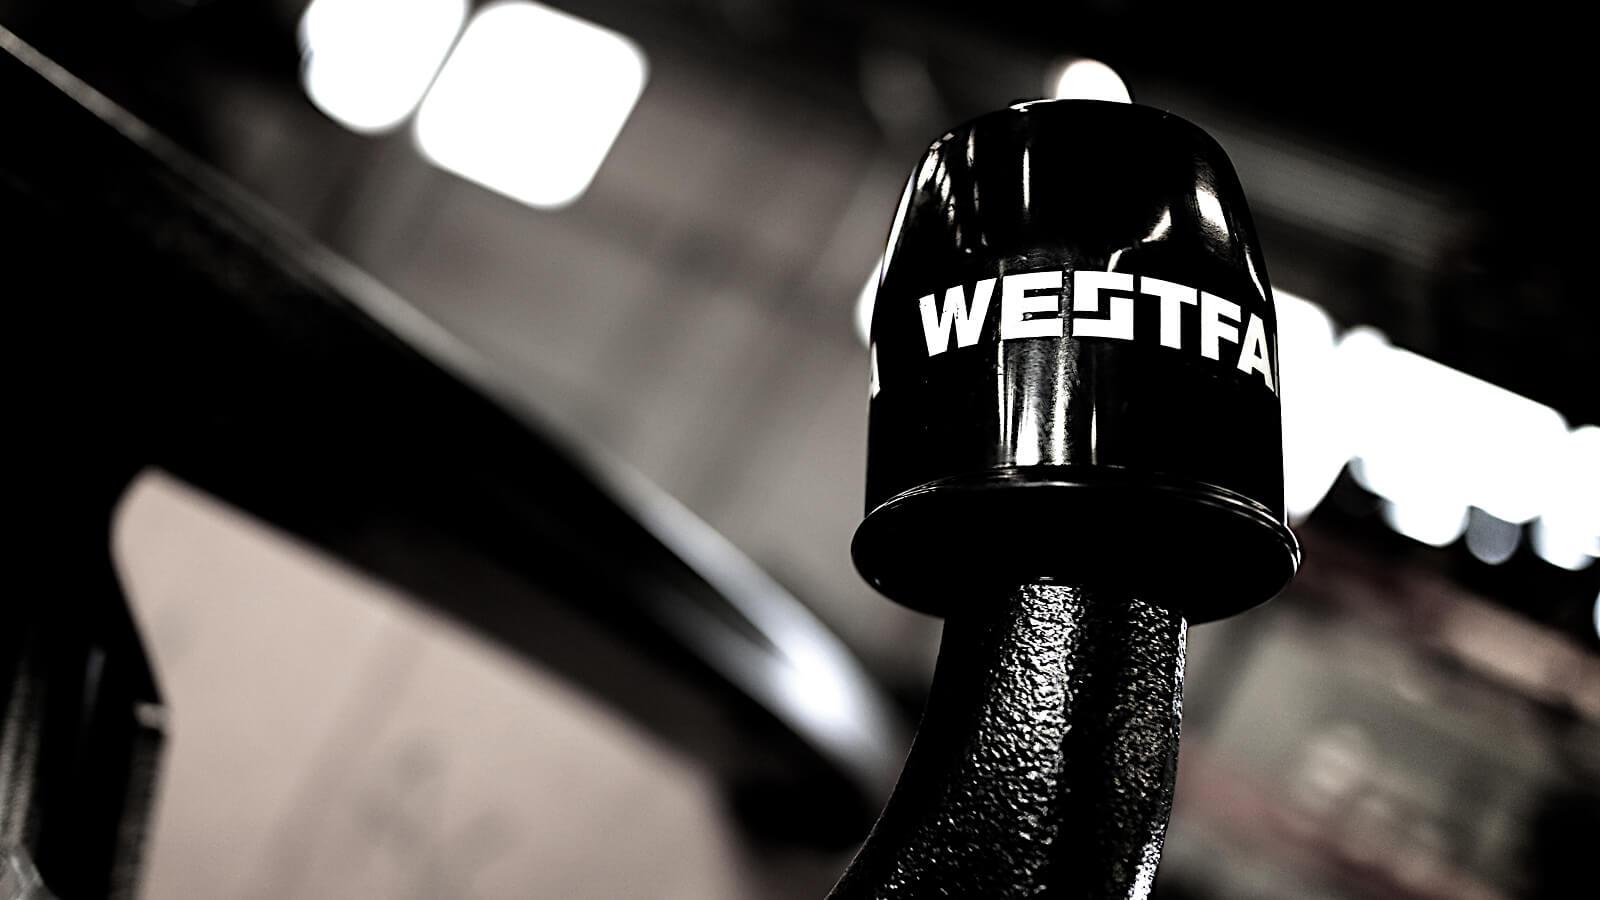 Westfalia vetokoukku Koukkupaja Oy